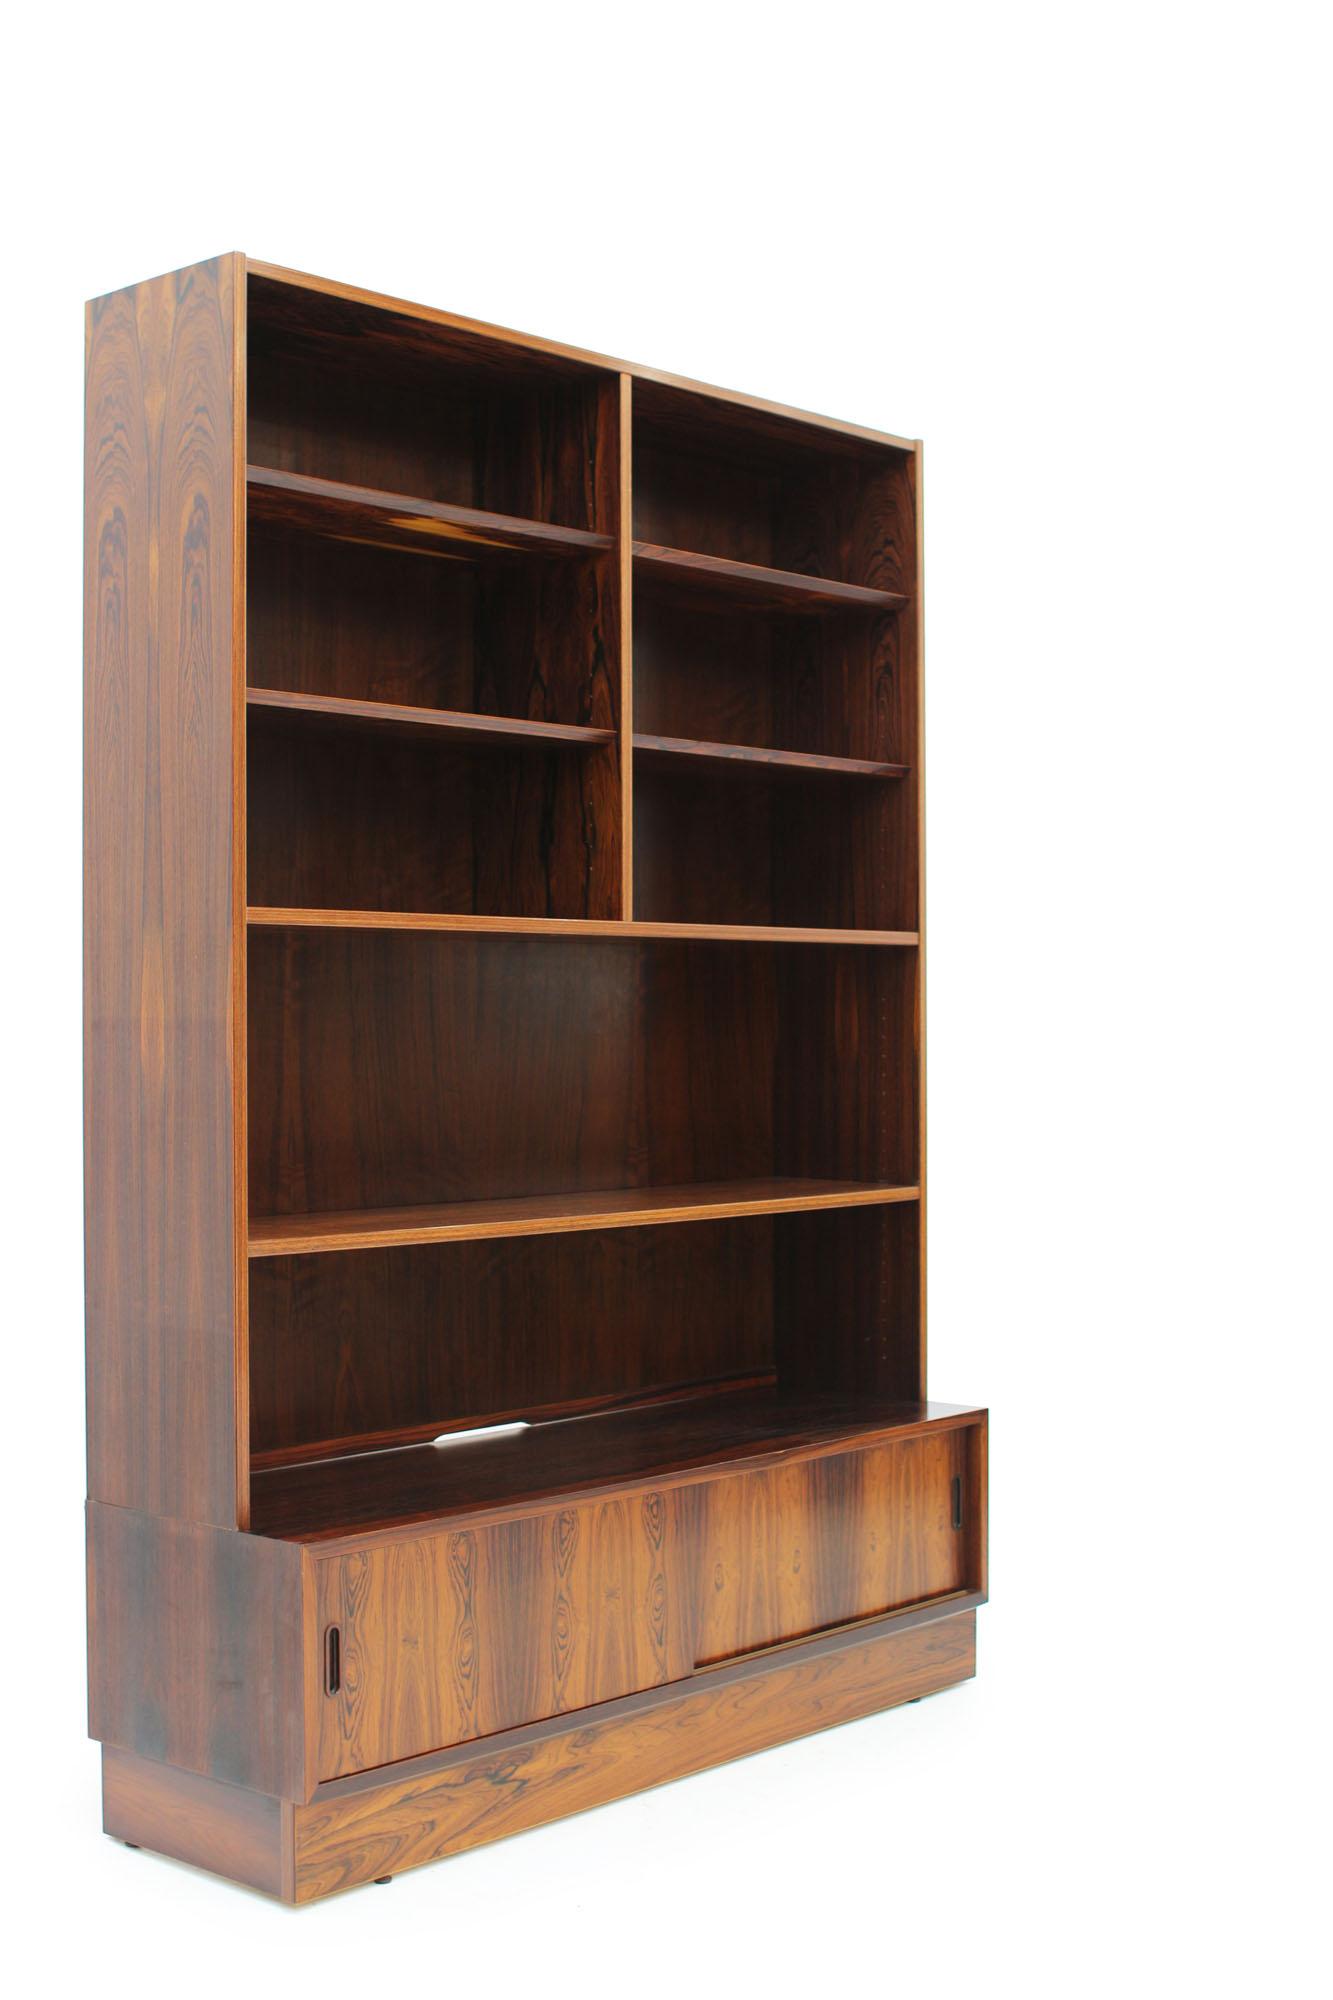 Poul Hundevad Rosewood Bookcase Made in Denmark (5).jpg